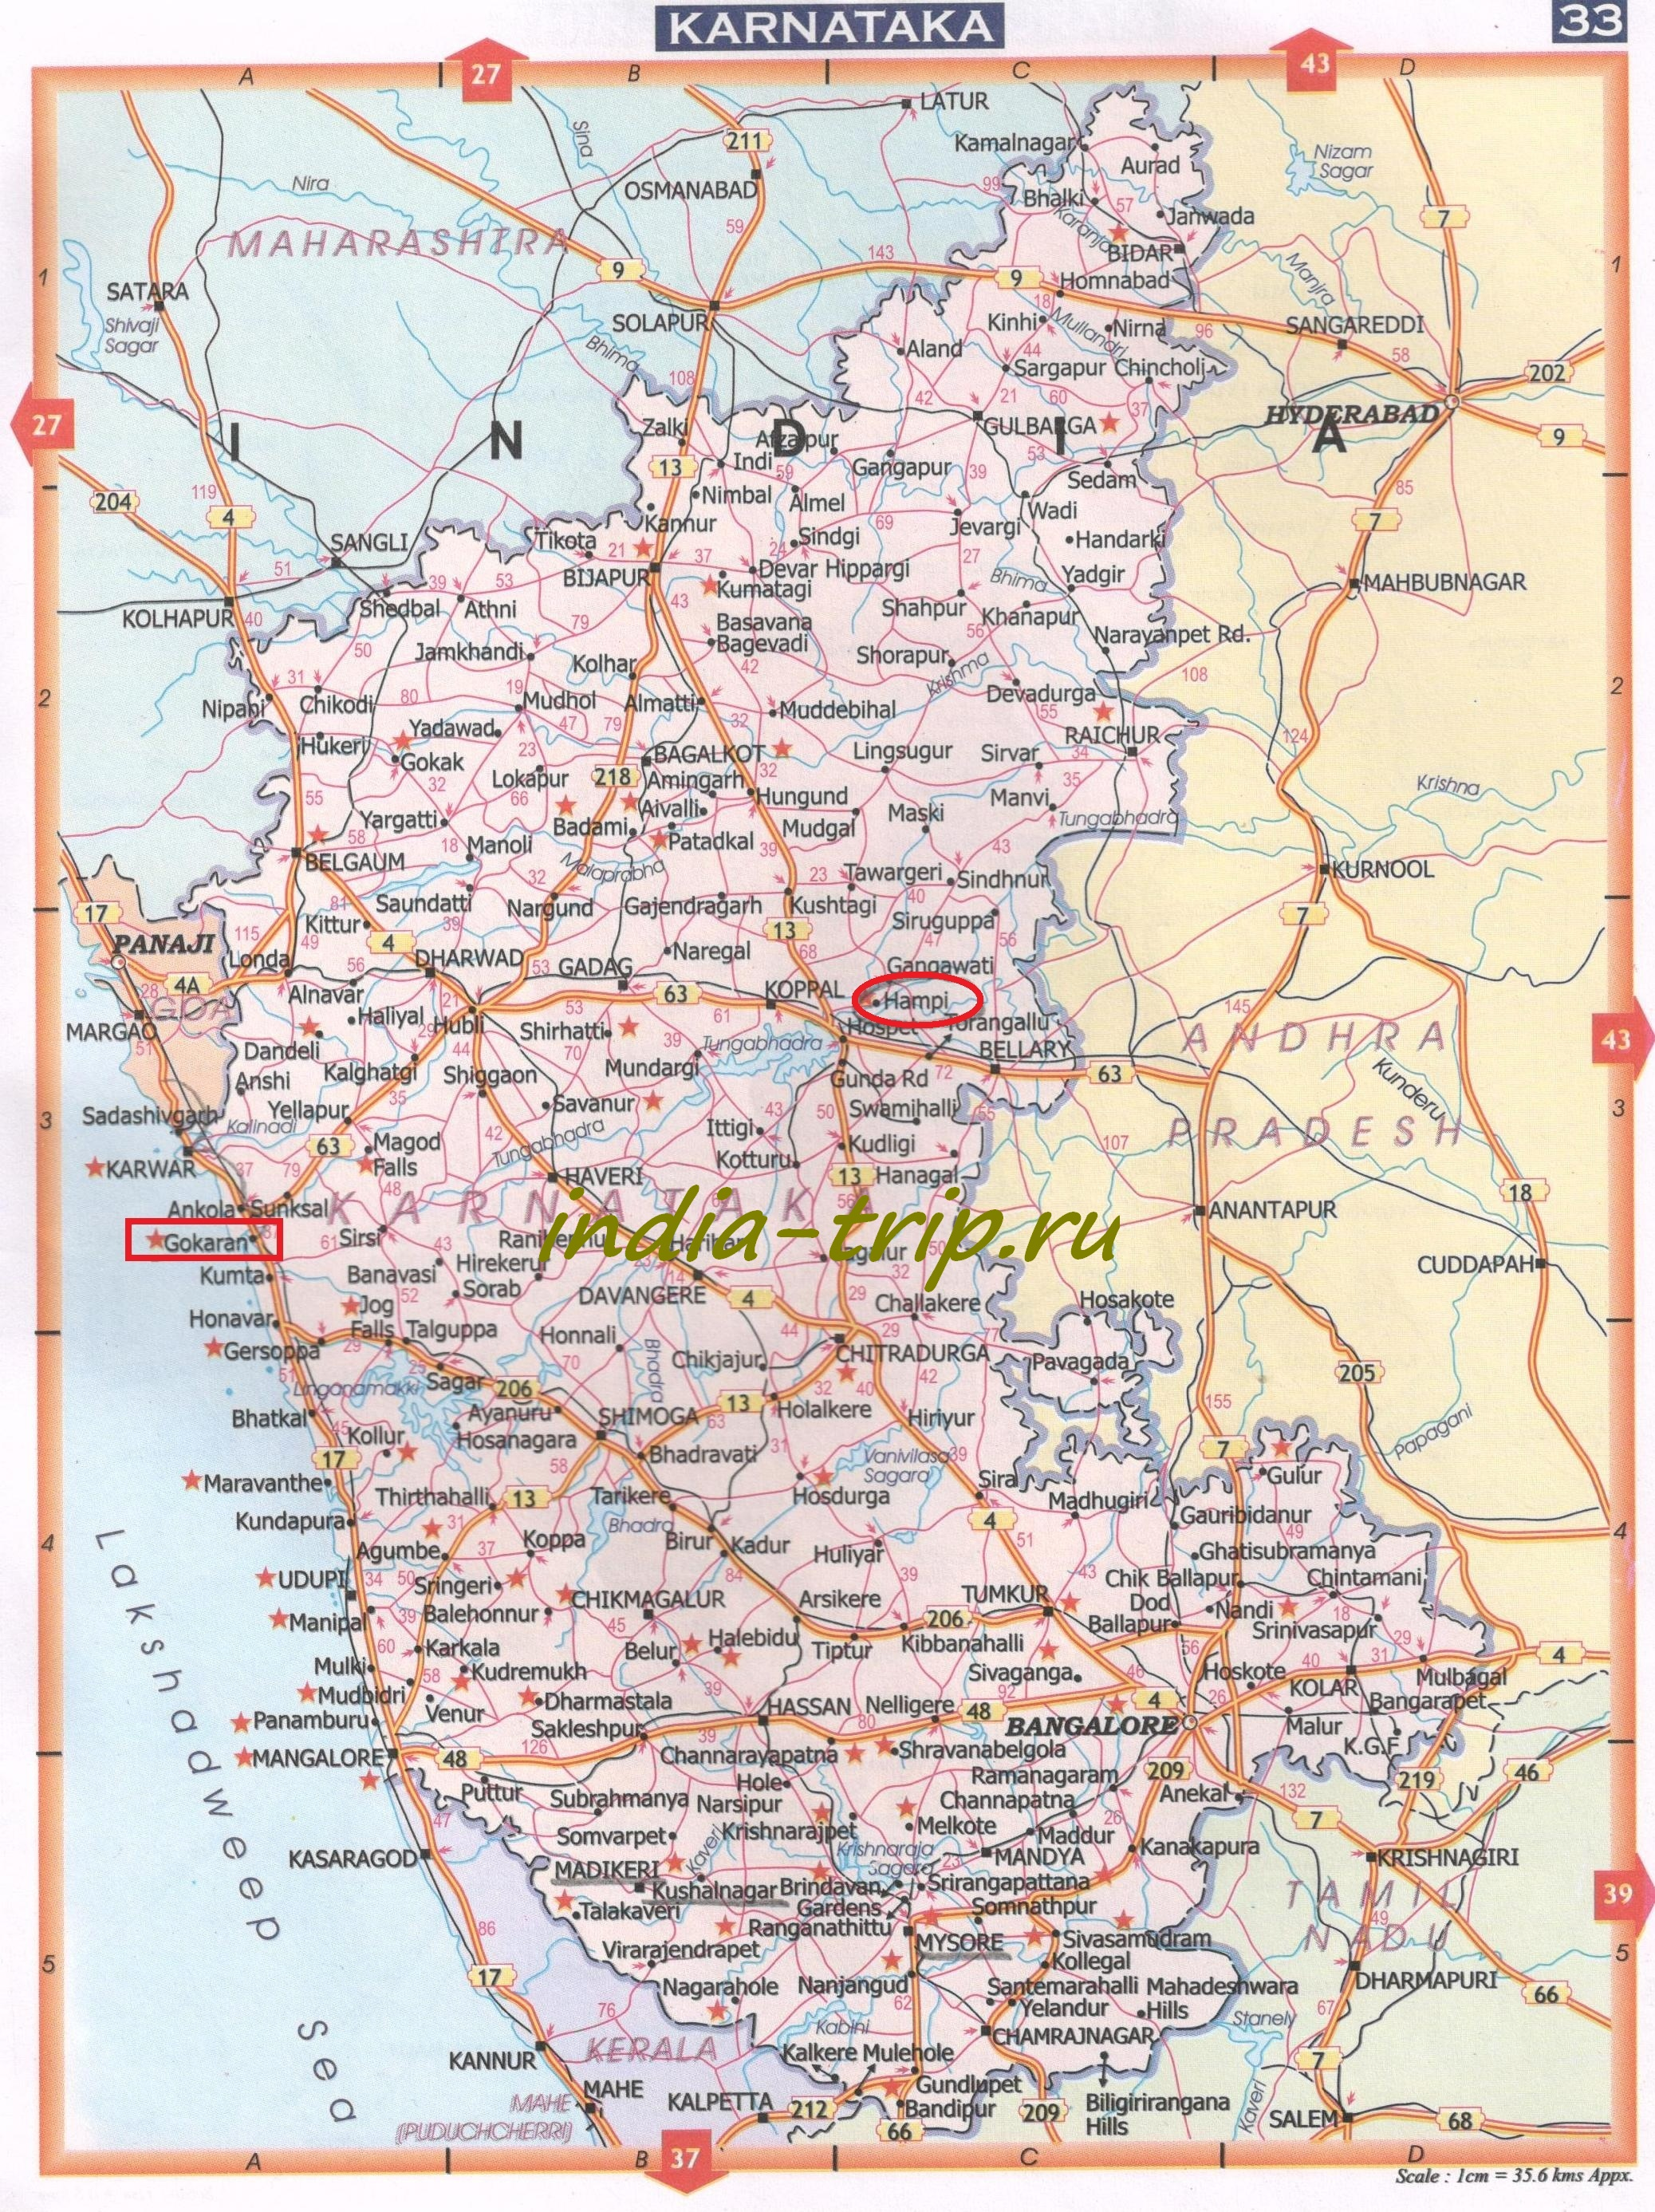 Расположение Гокарны на карте штата Карнатака